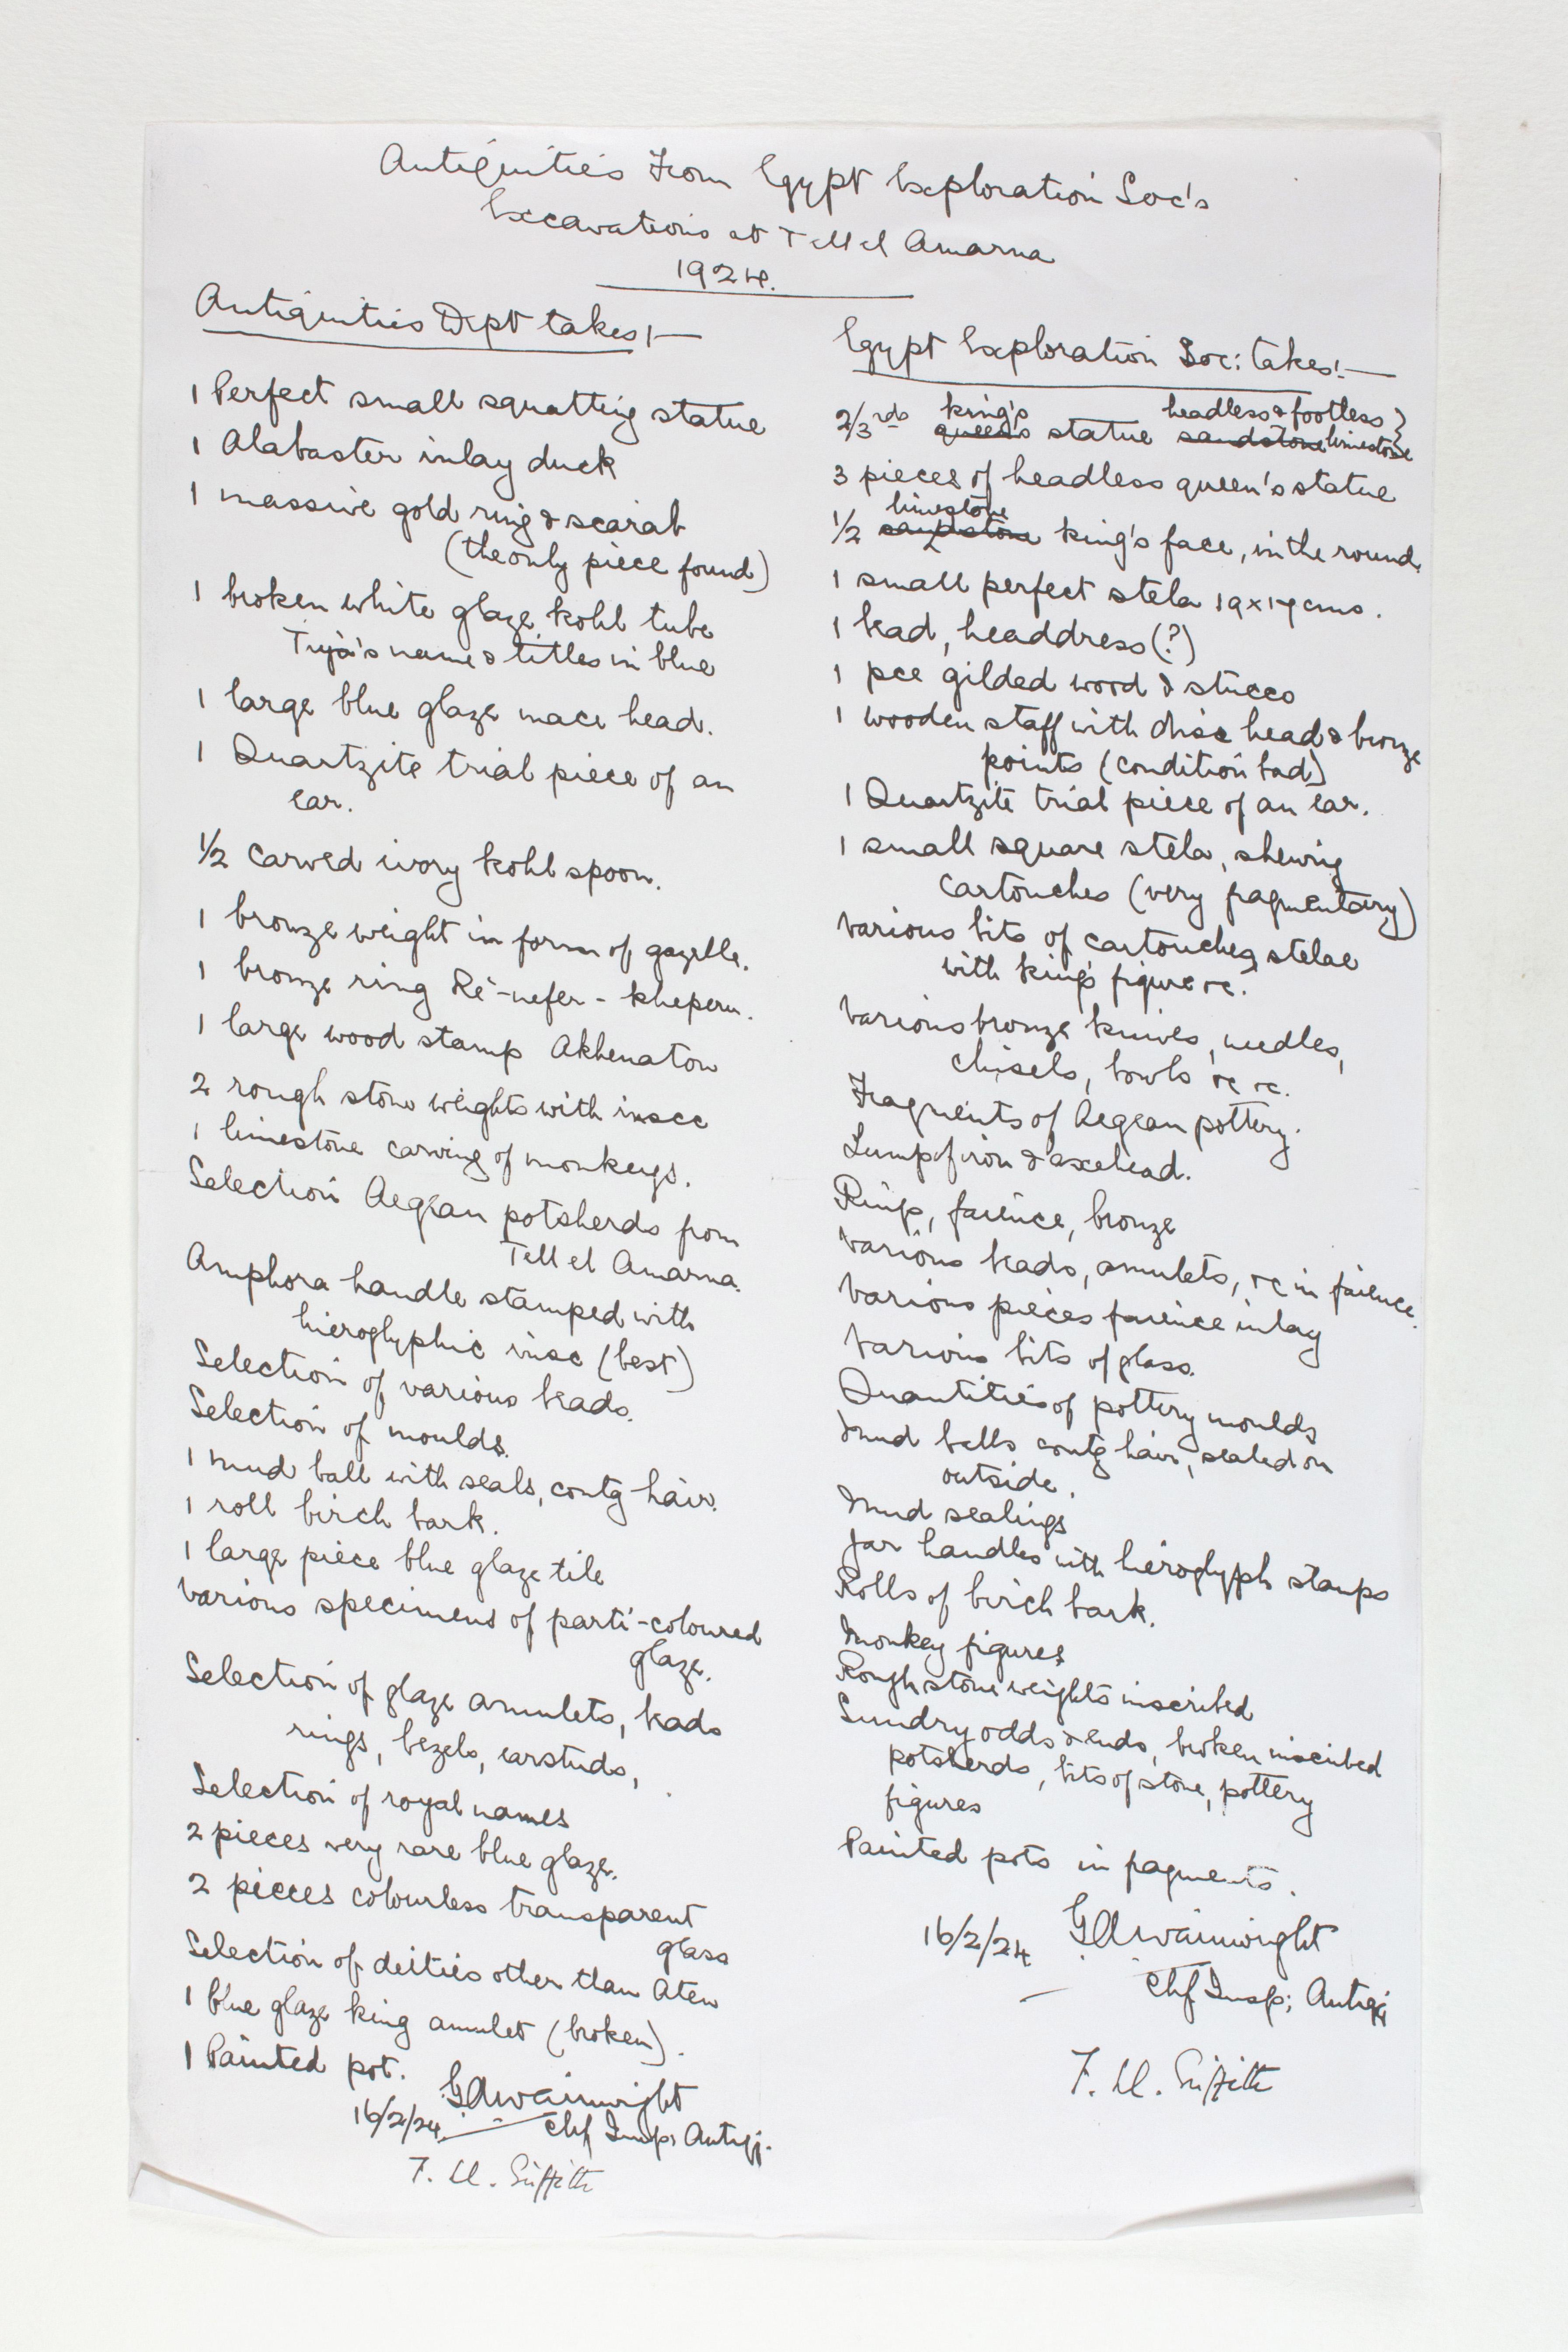 1924 Tell el-Amarna Individual institution list PMA/WFP1/D/27/1